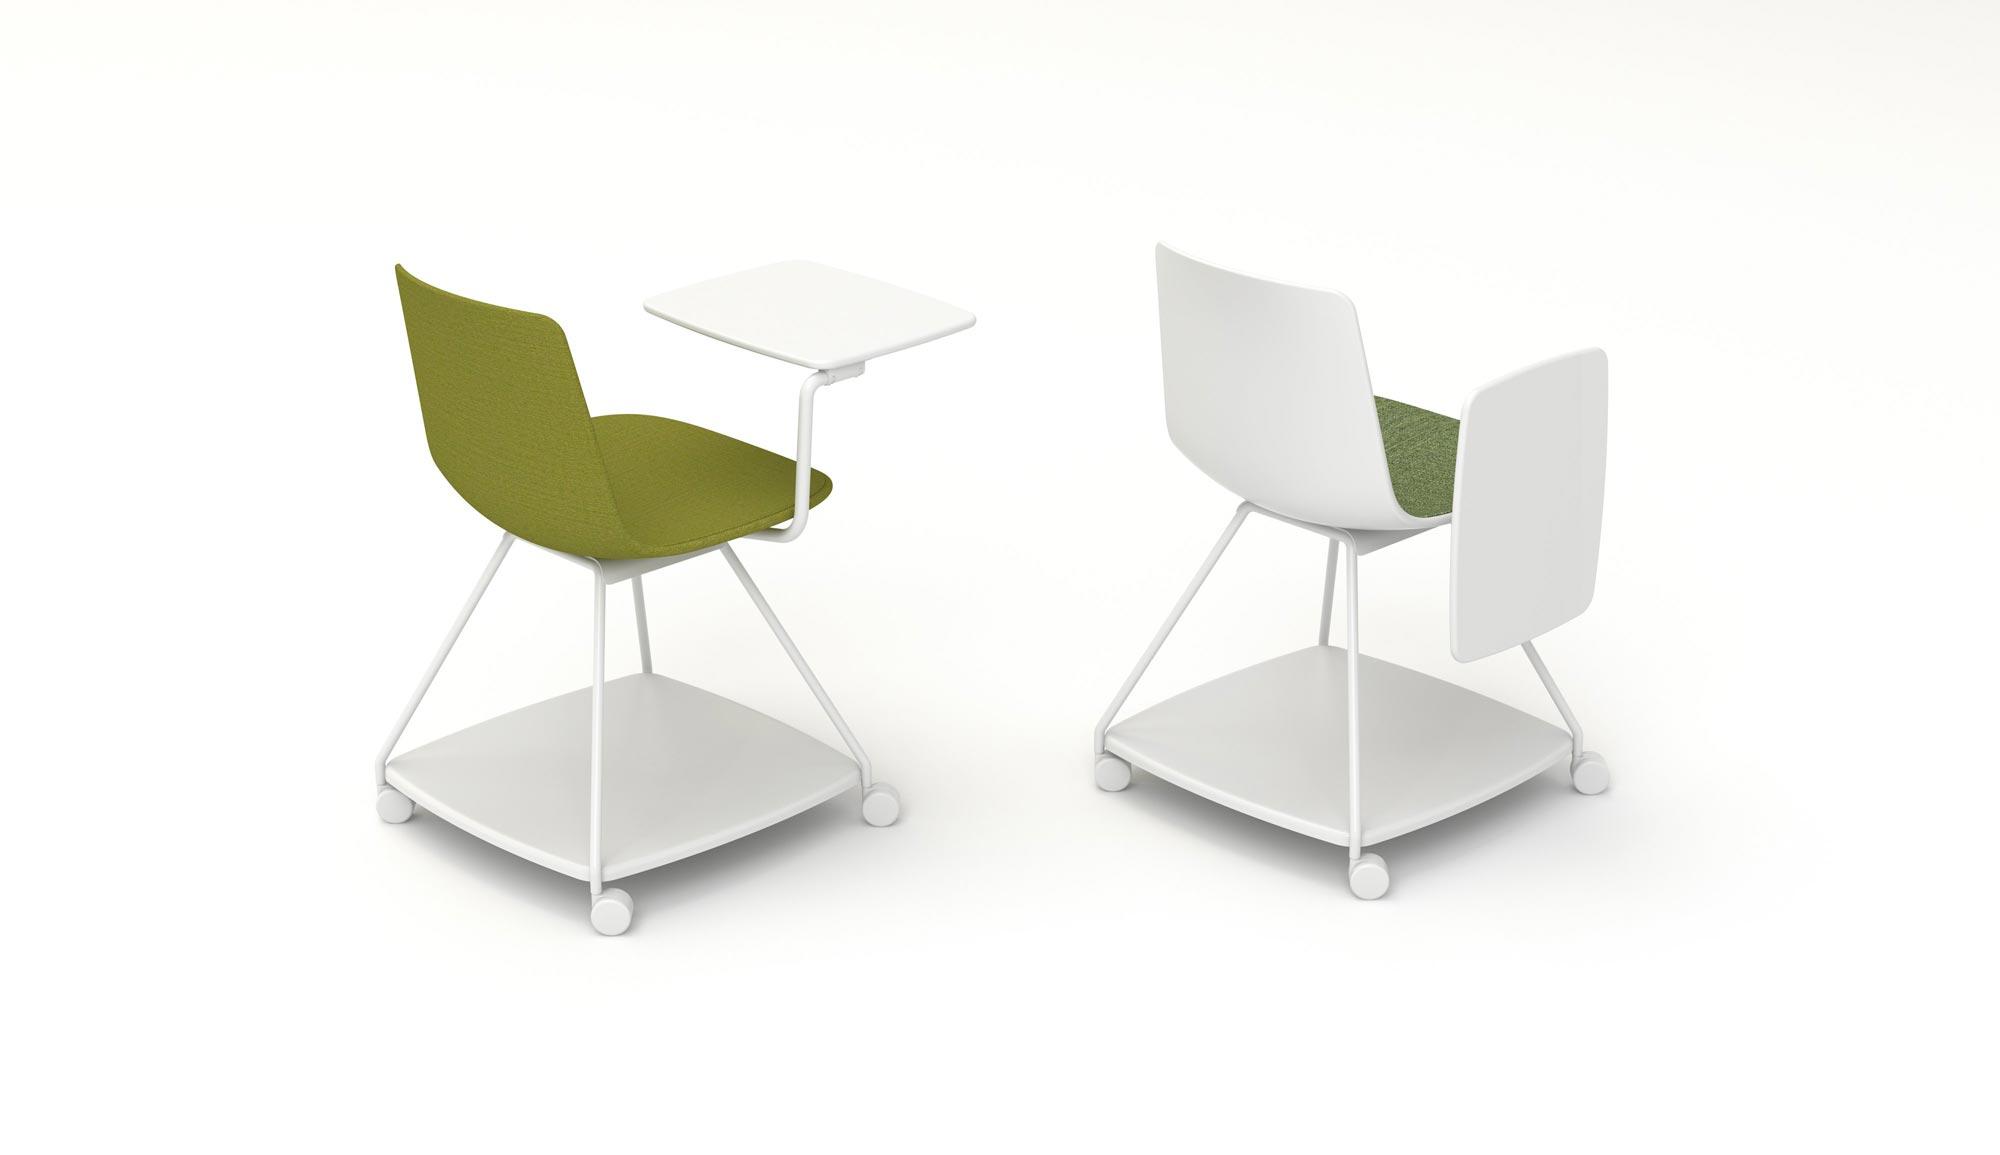 Enea soft office furniture proposals at orgatec 2016 - Furniture images ...